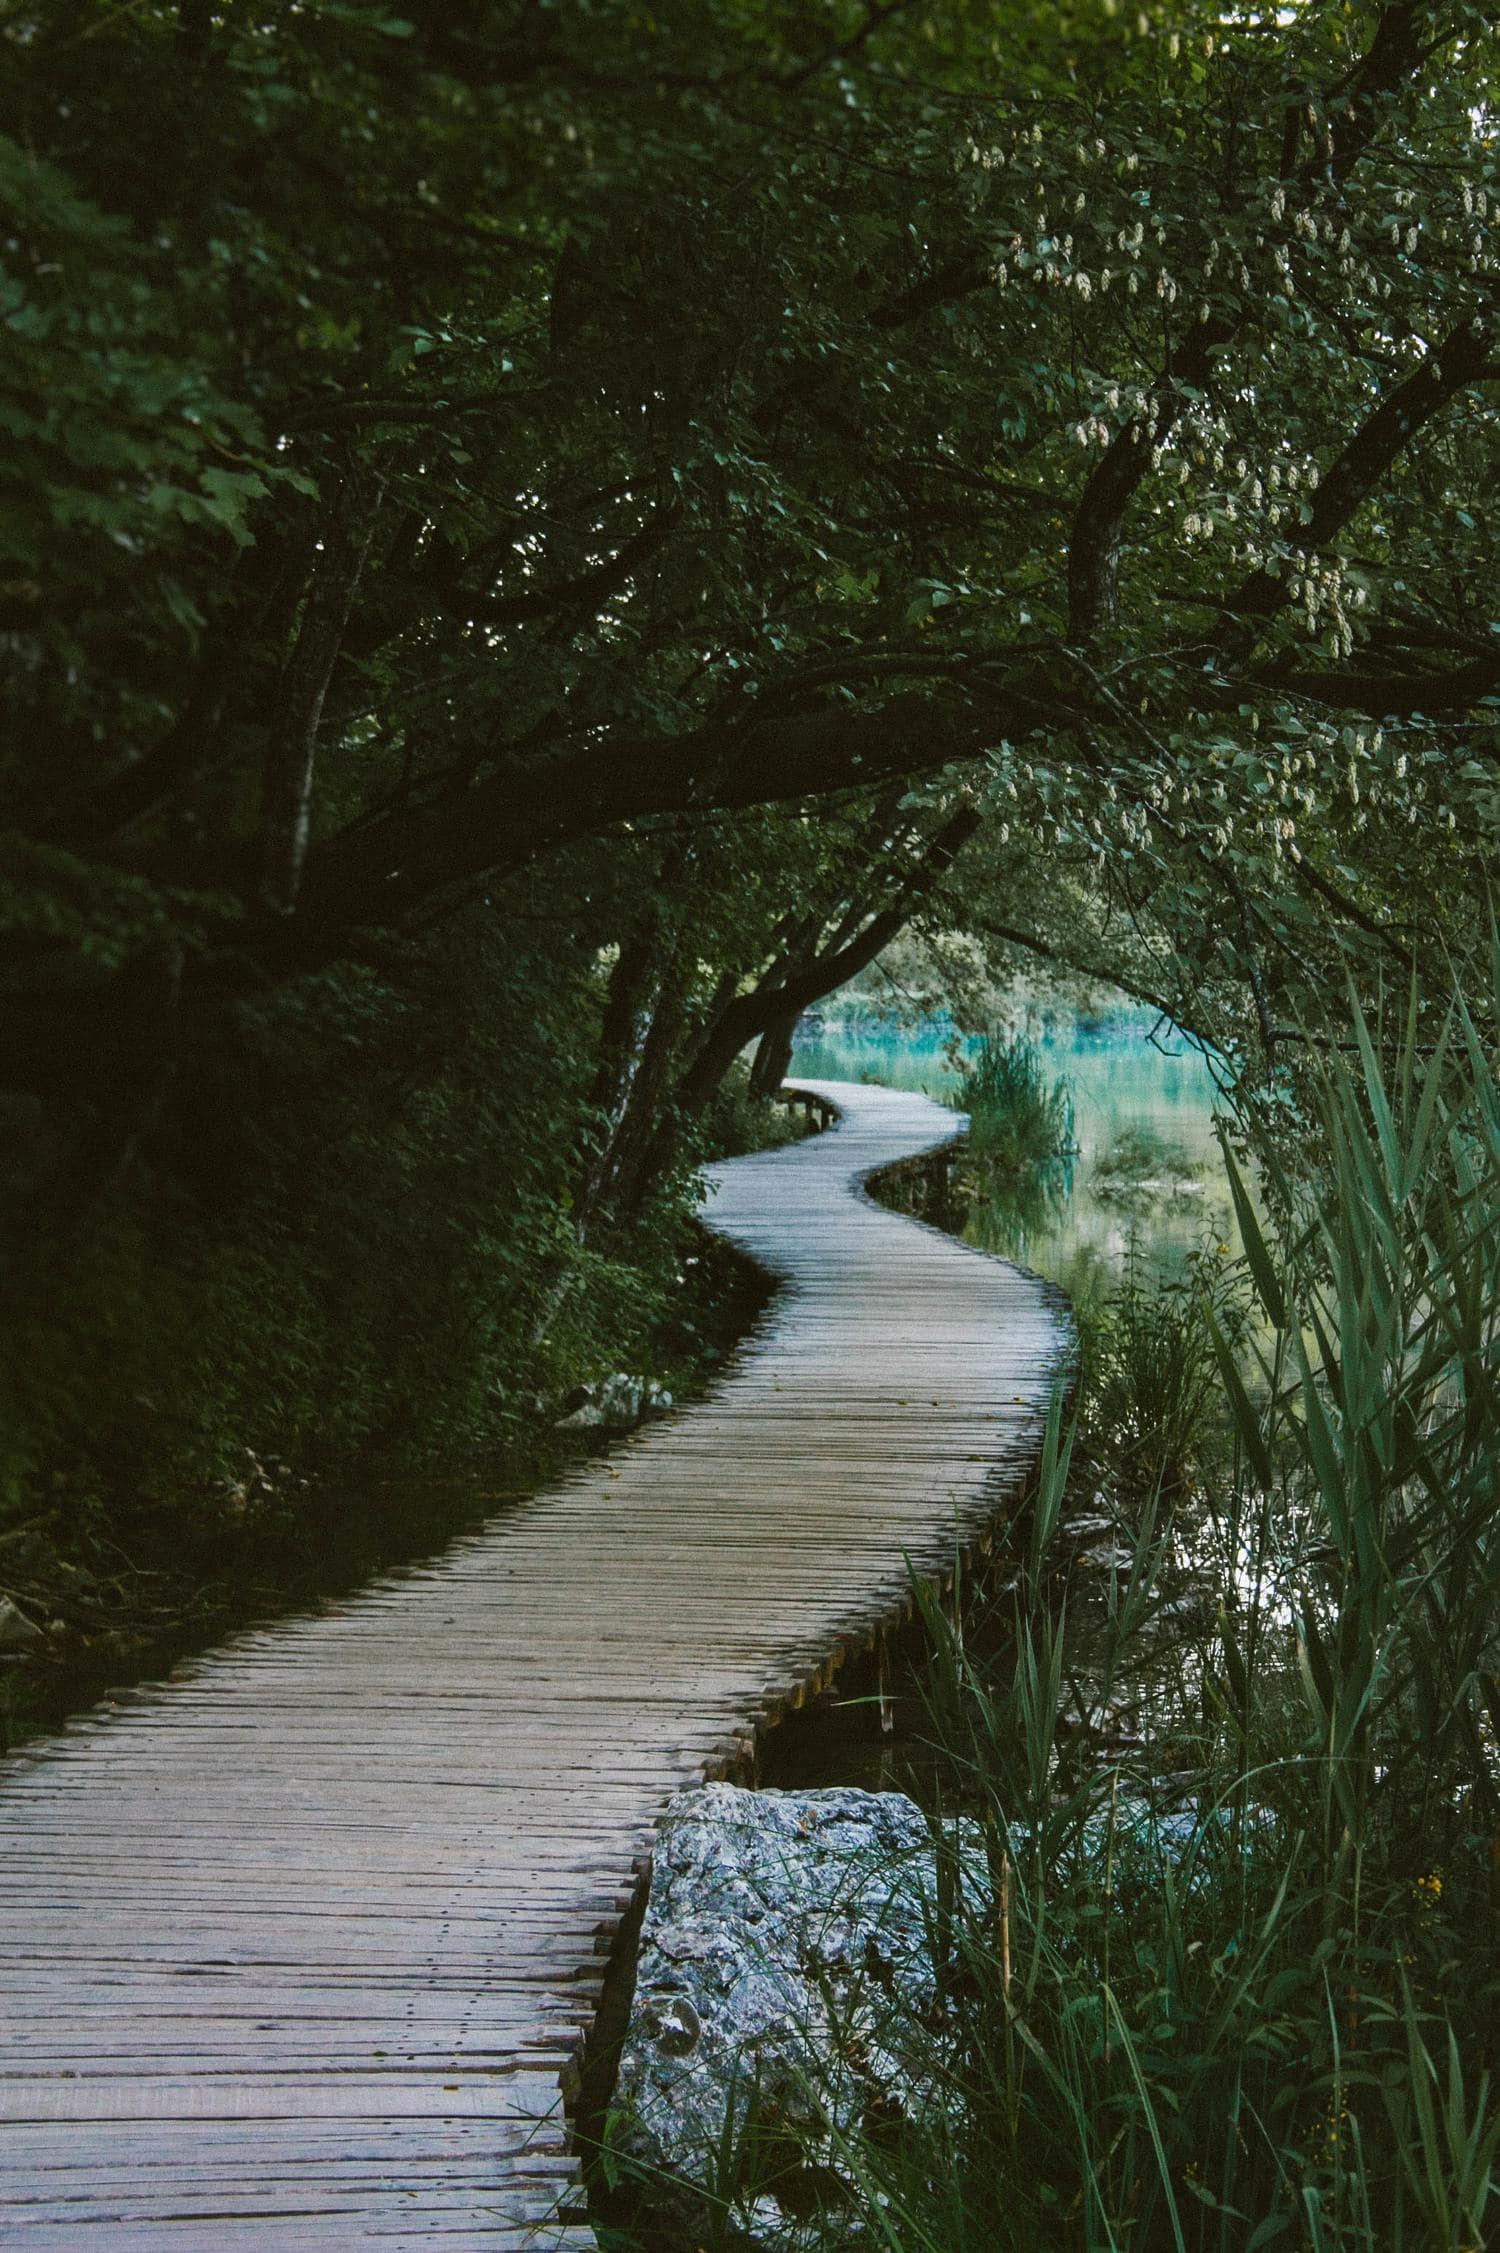 Camino sugerente